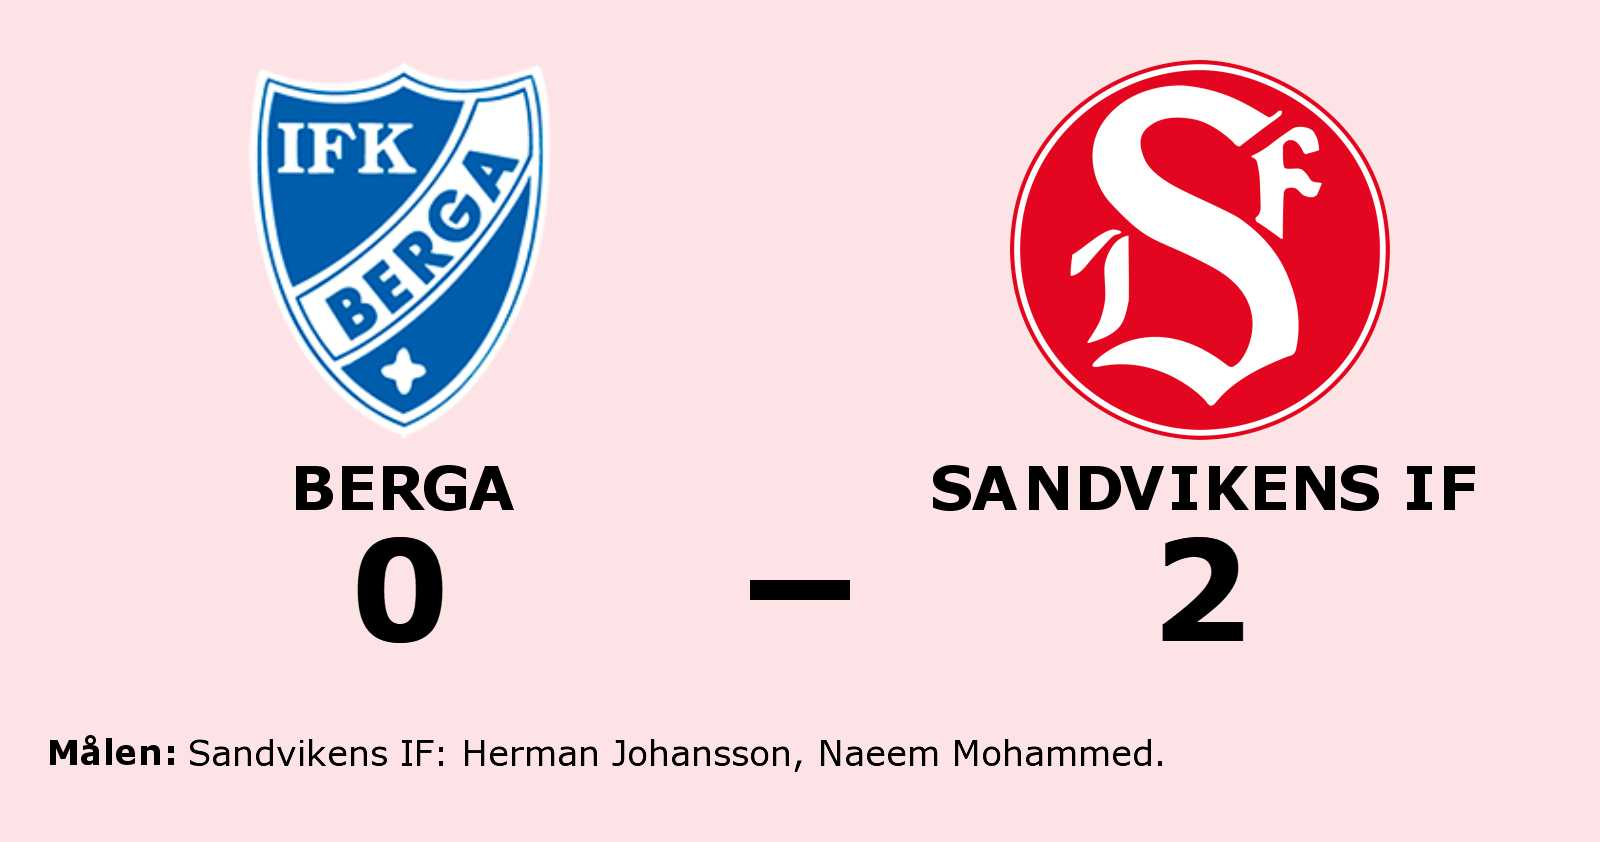 Herman Johansson och Naeem Mohammed målgörare i Sandvikens IF:s seger